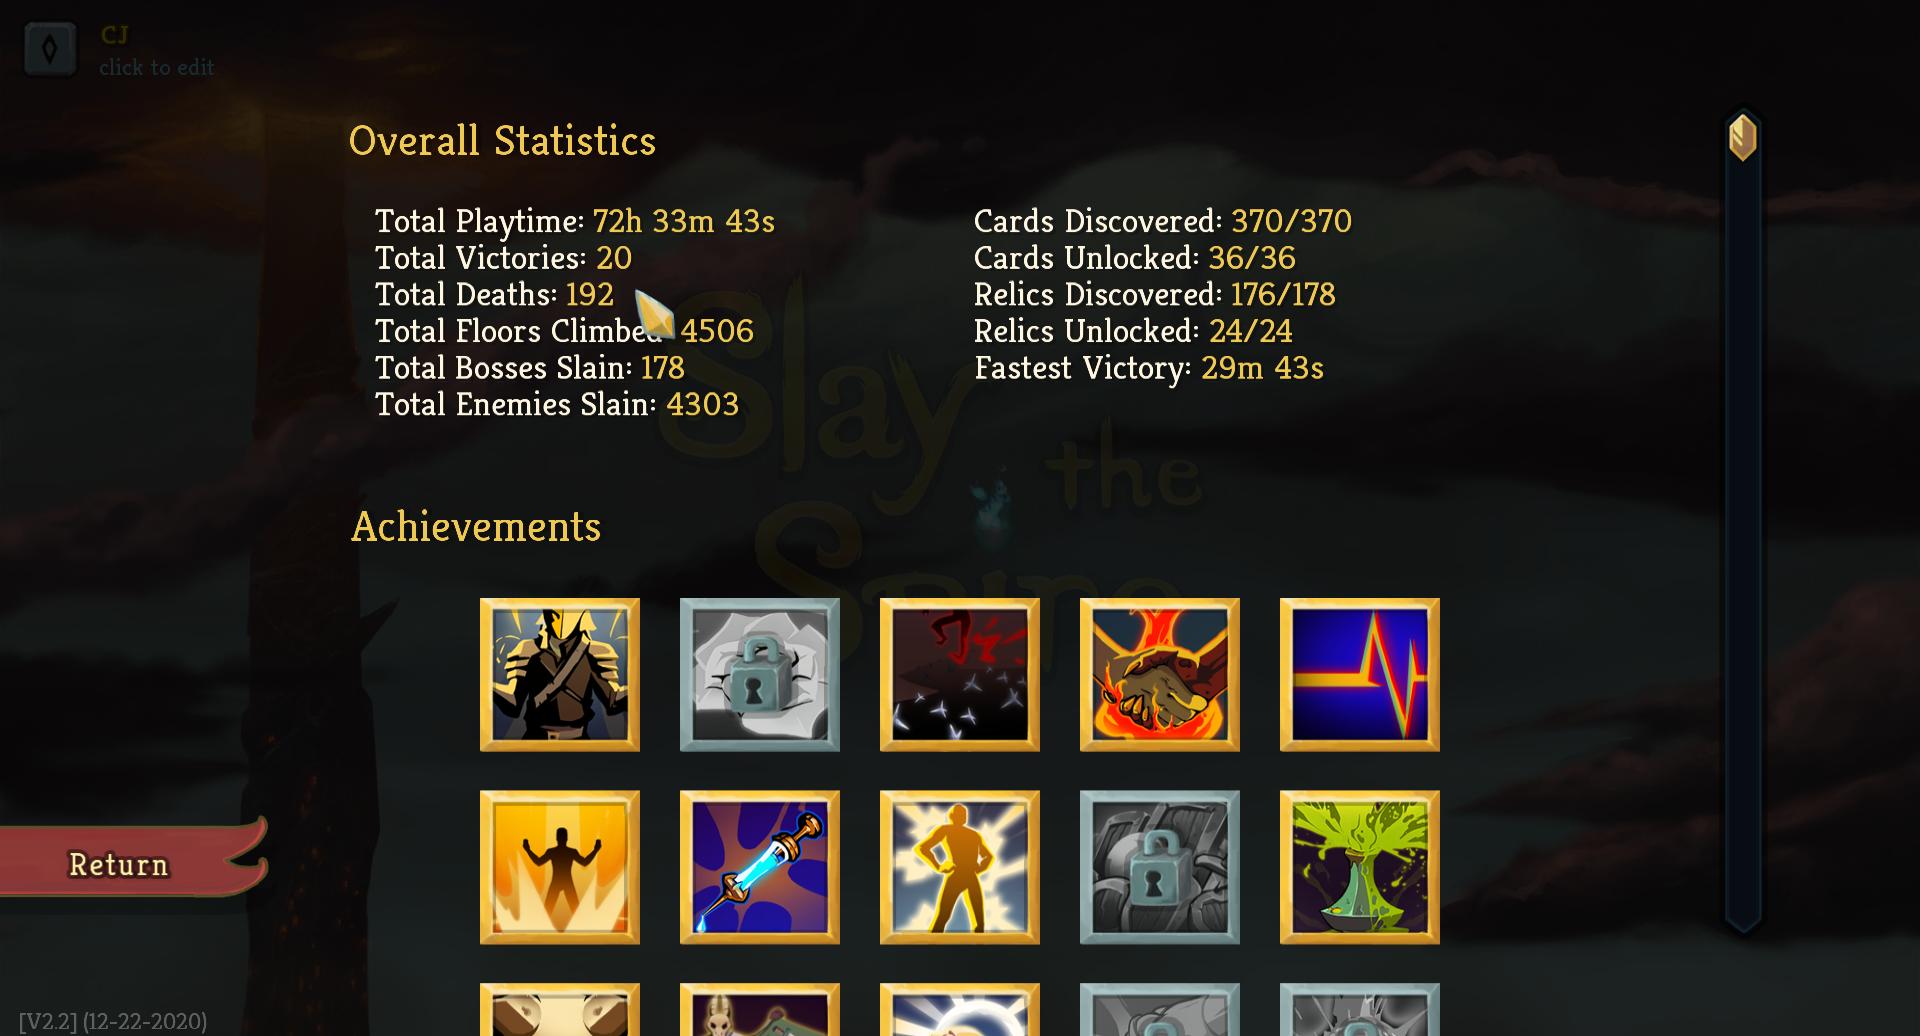 20 total victories, 192 total deaths